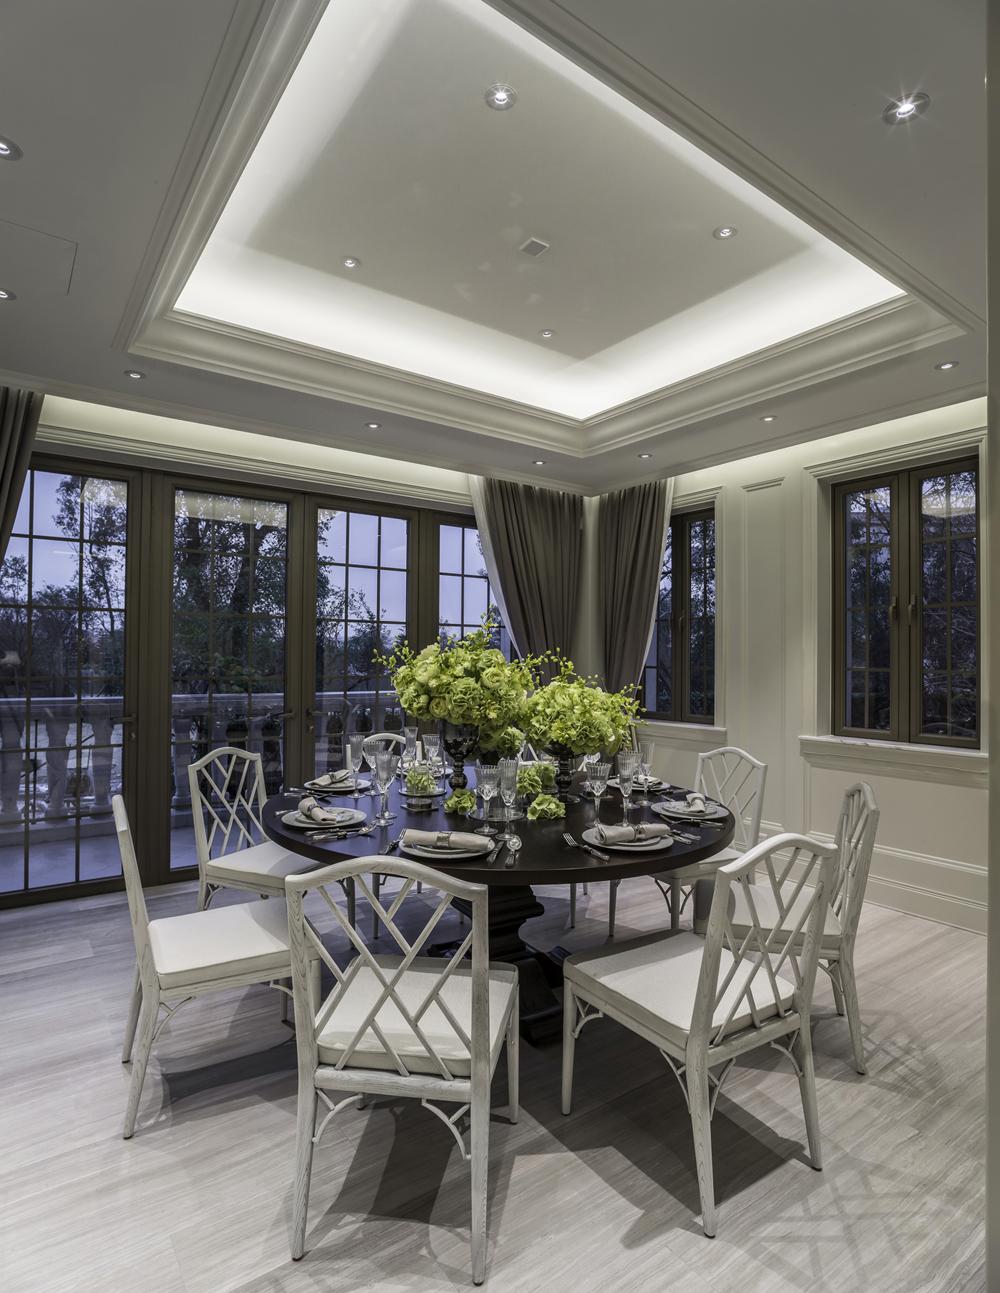 Attitude Asia Interior Design Luxury residential interior by Suzanne Wong Guangzhou China Panyu